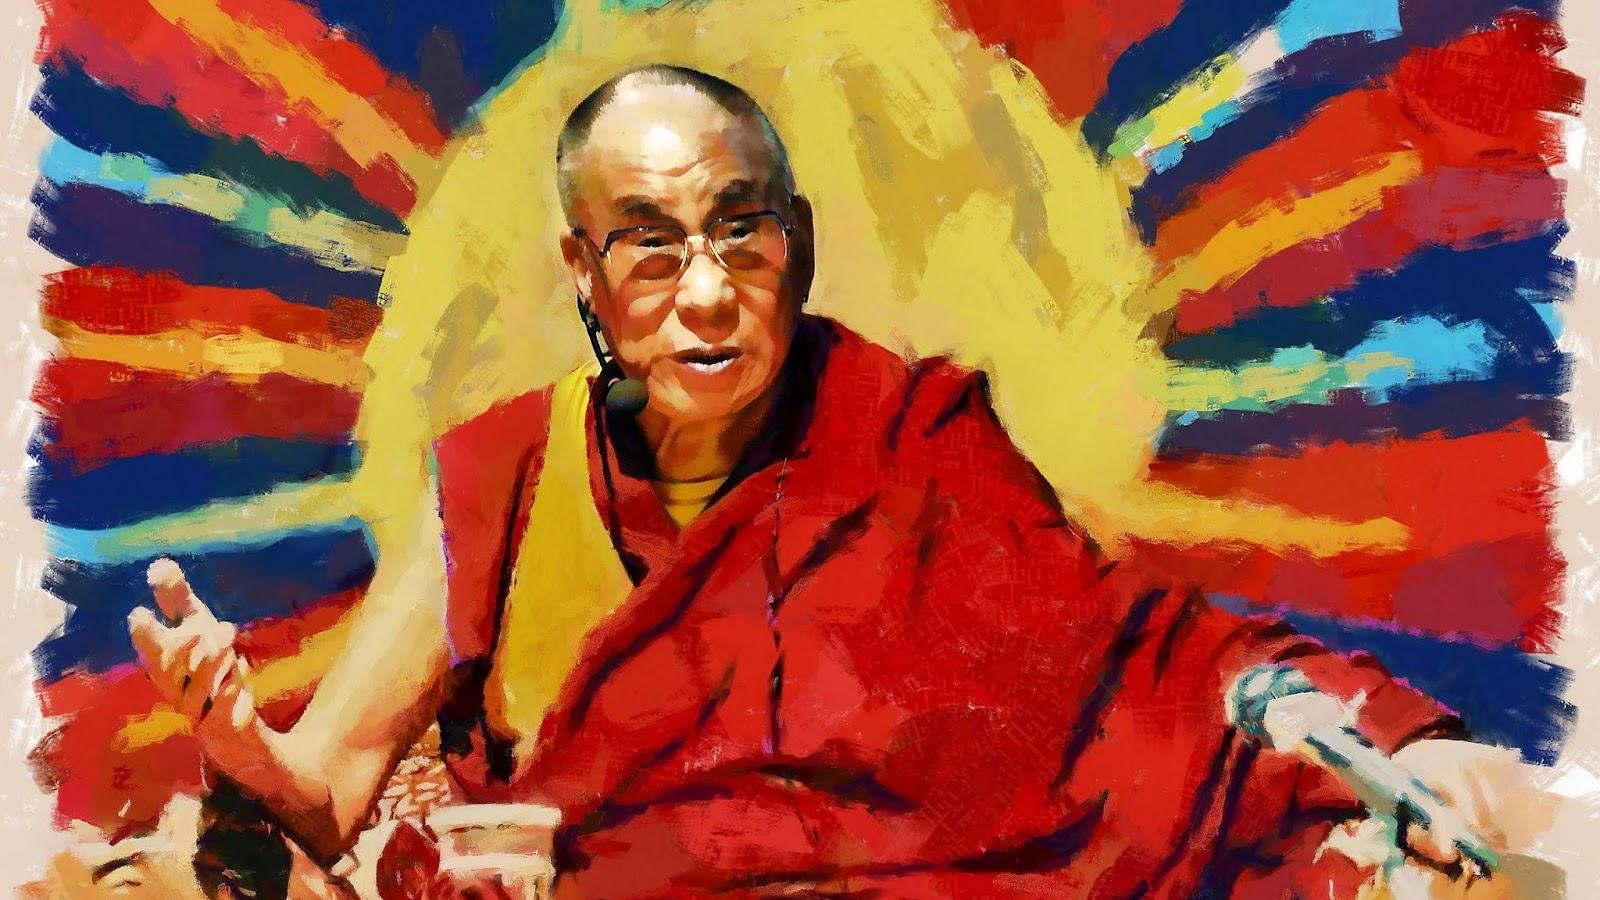 Religion, Tibetan Buddhism, Buddhism, Dalai Lama, Tenzin wallpapers